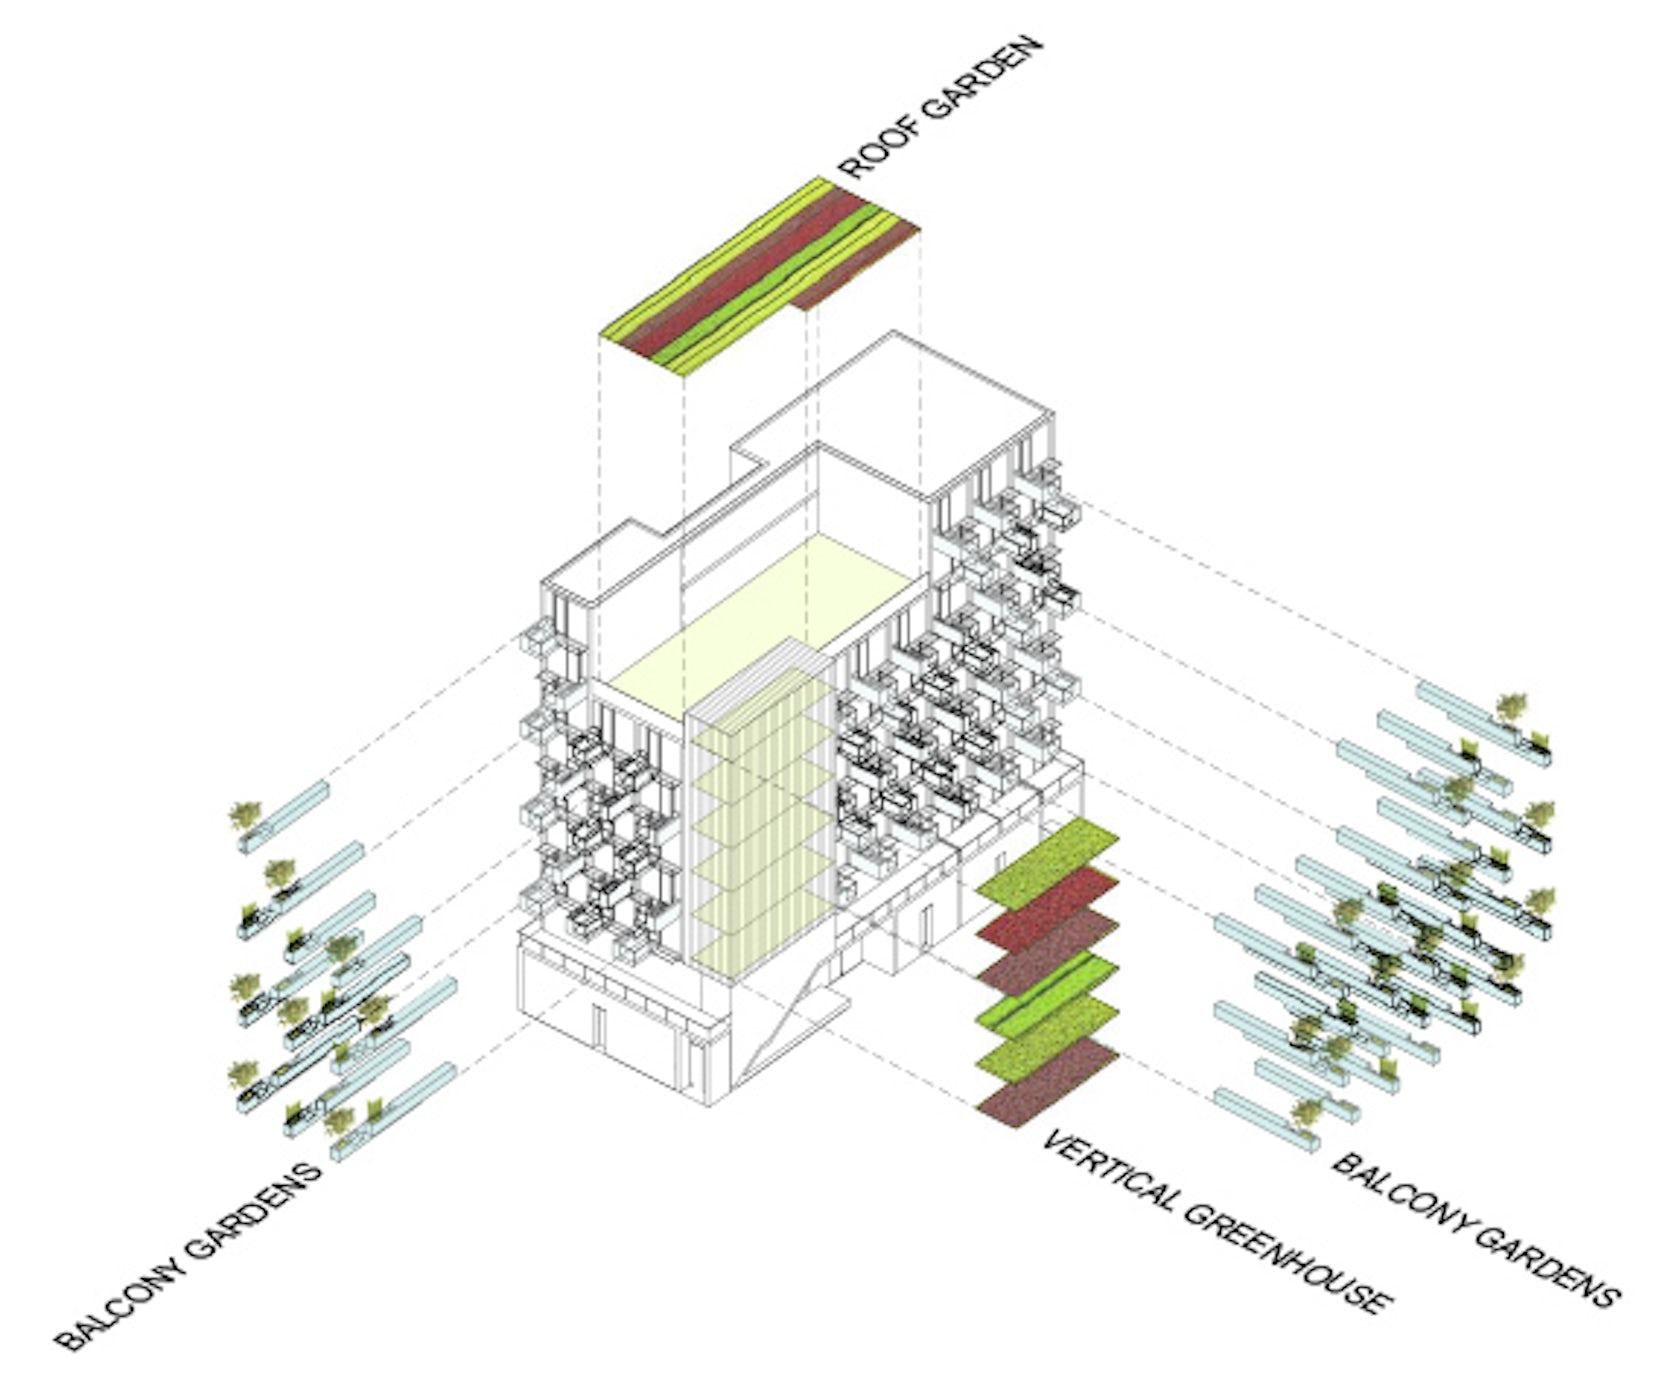 Microgreens adapt housing ny architizer for Milo motors north syracuse